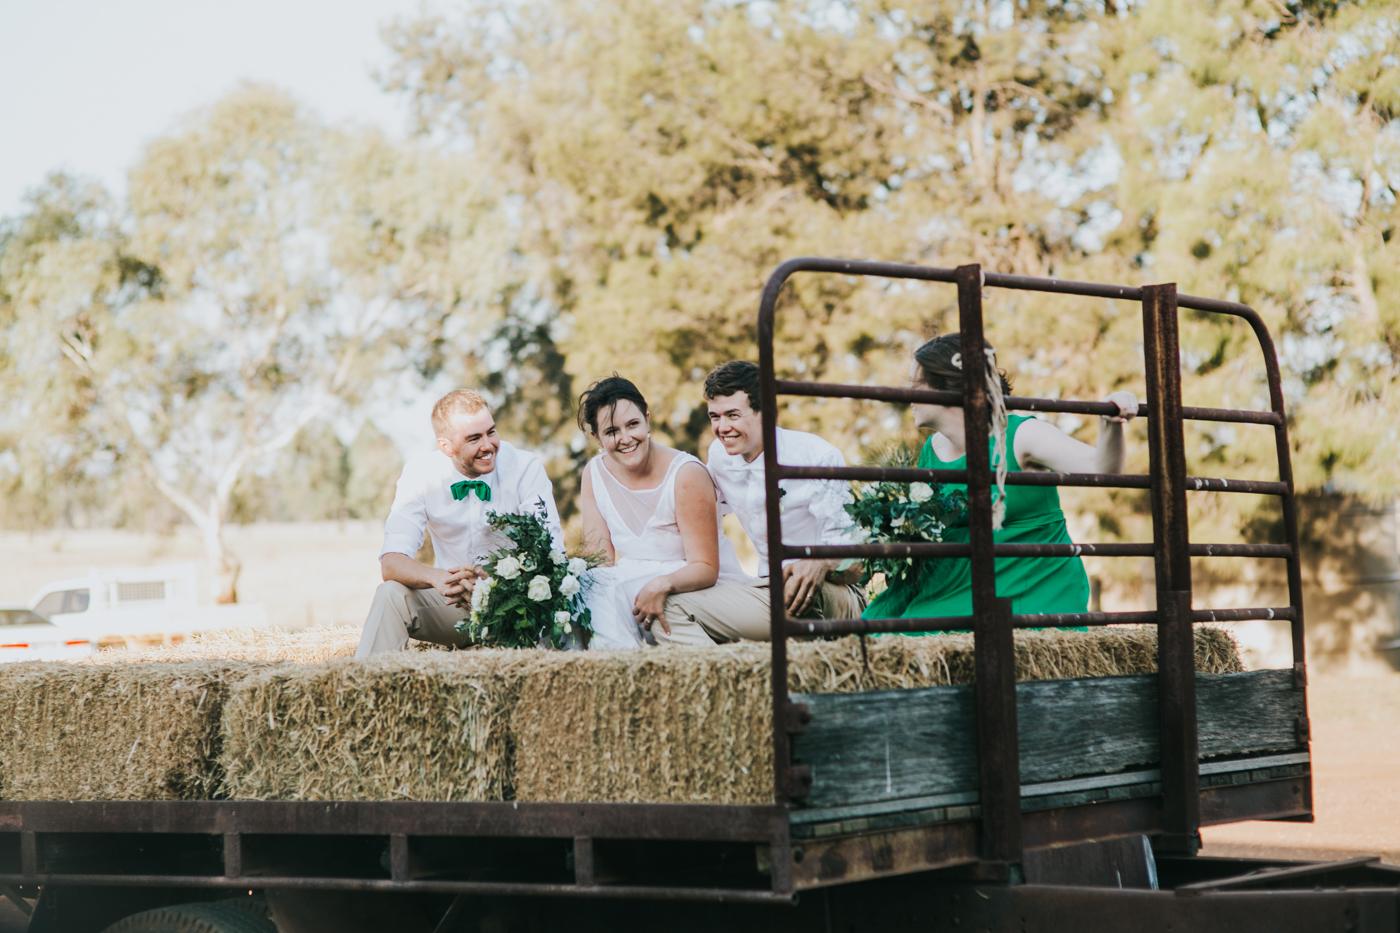 Nicolle & Jacob - Dubbo Wedding - Country Australia - Samantha Heather Photography-211.jpg